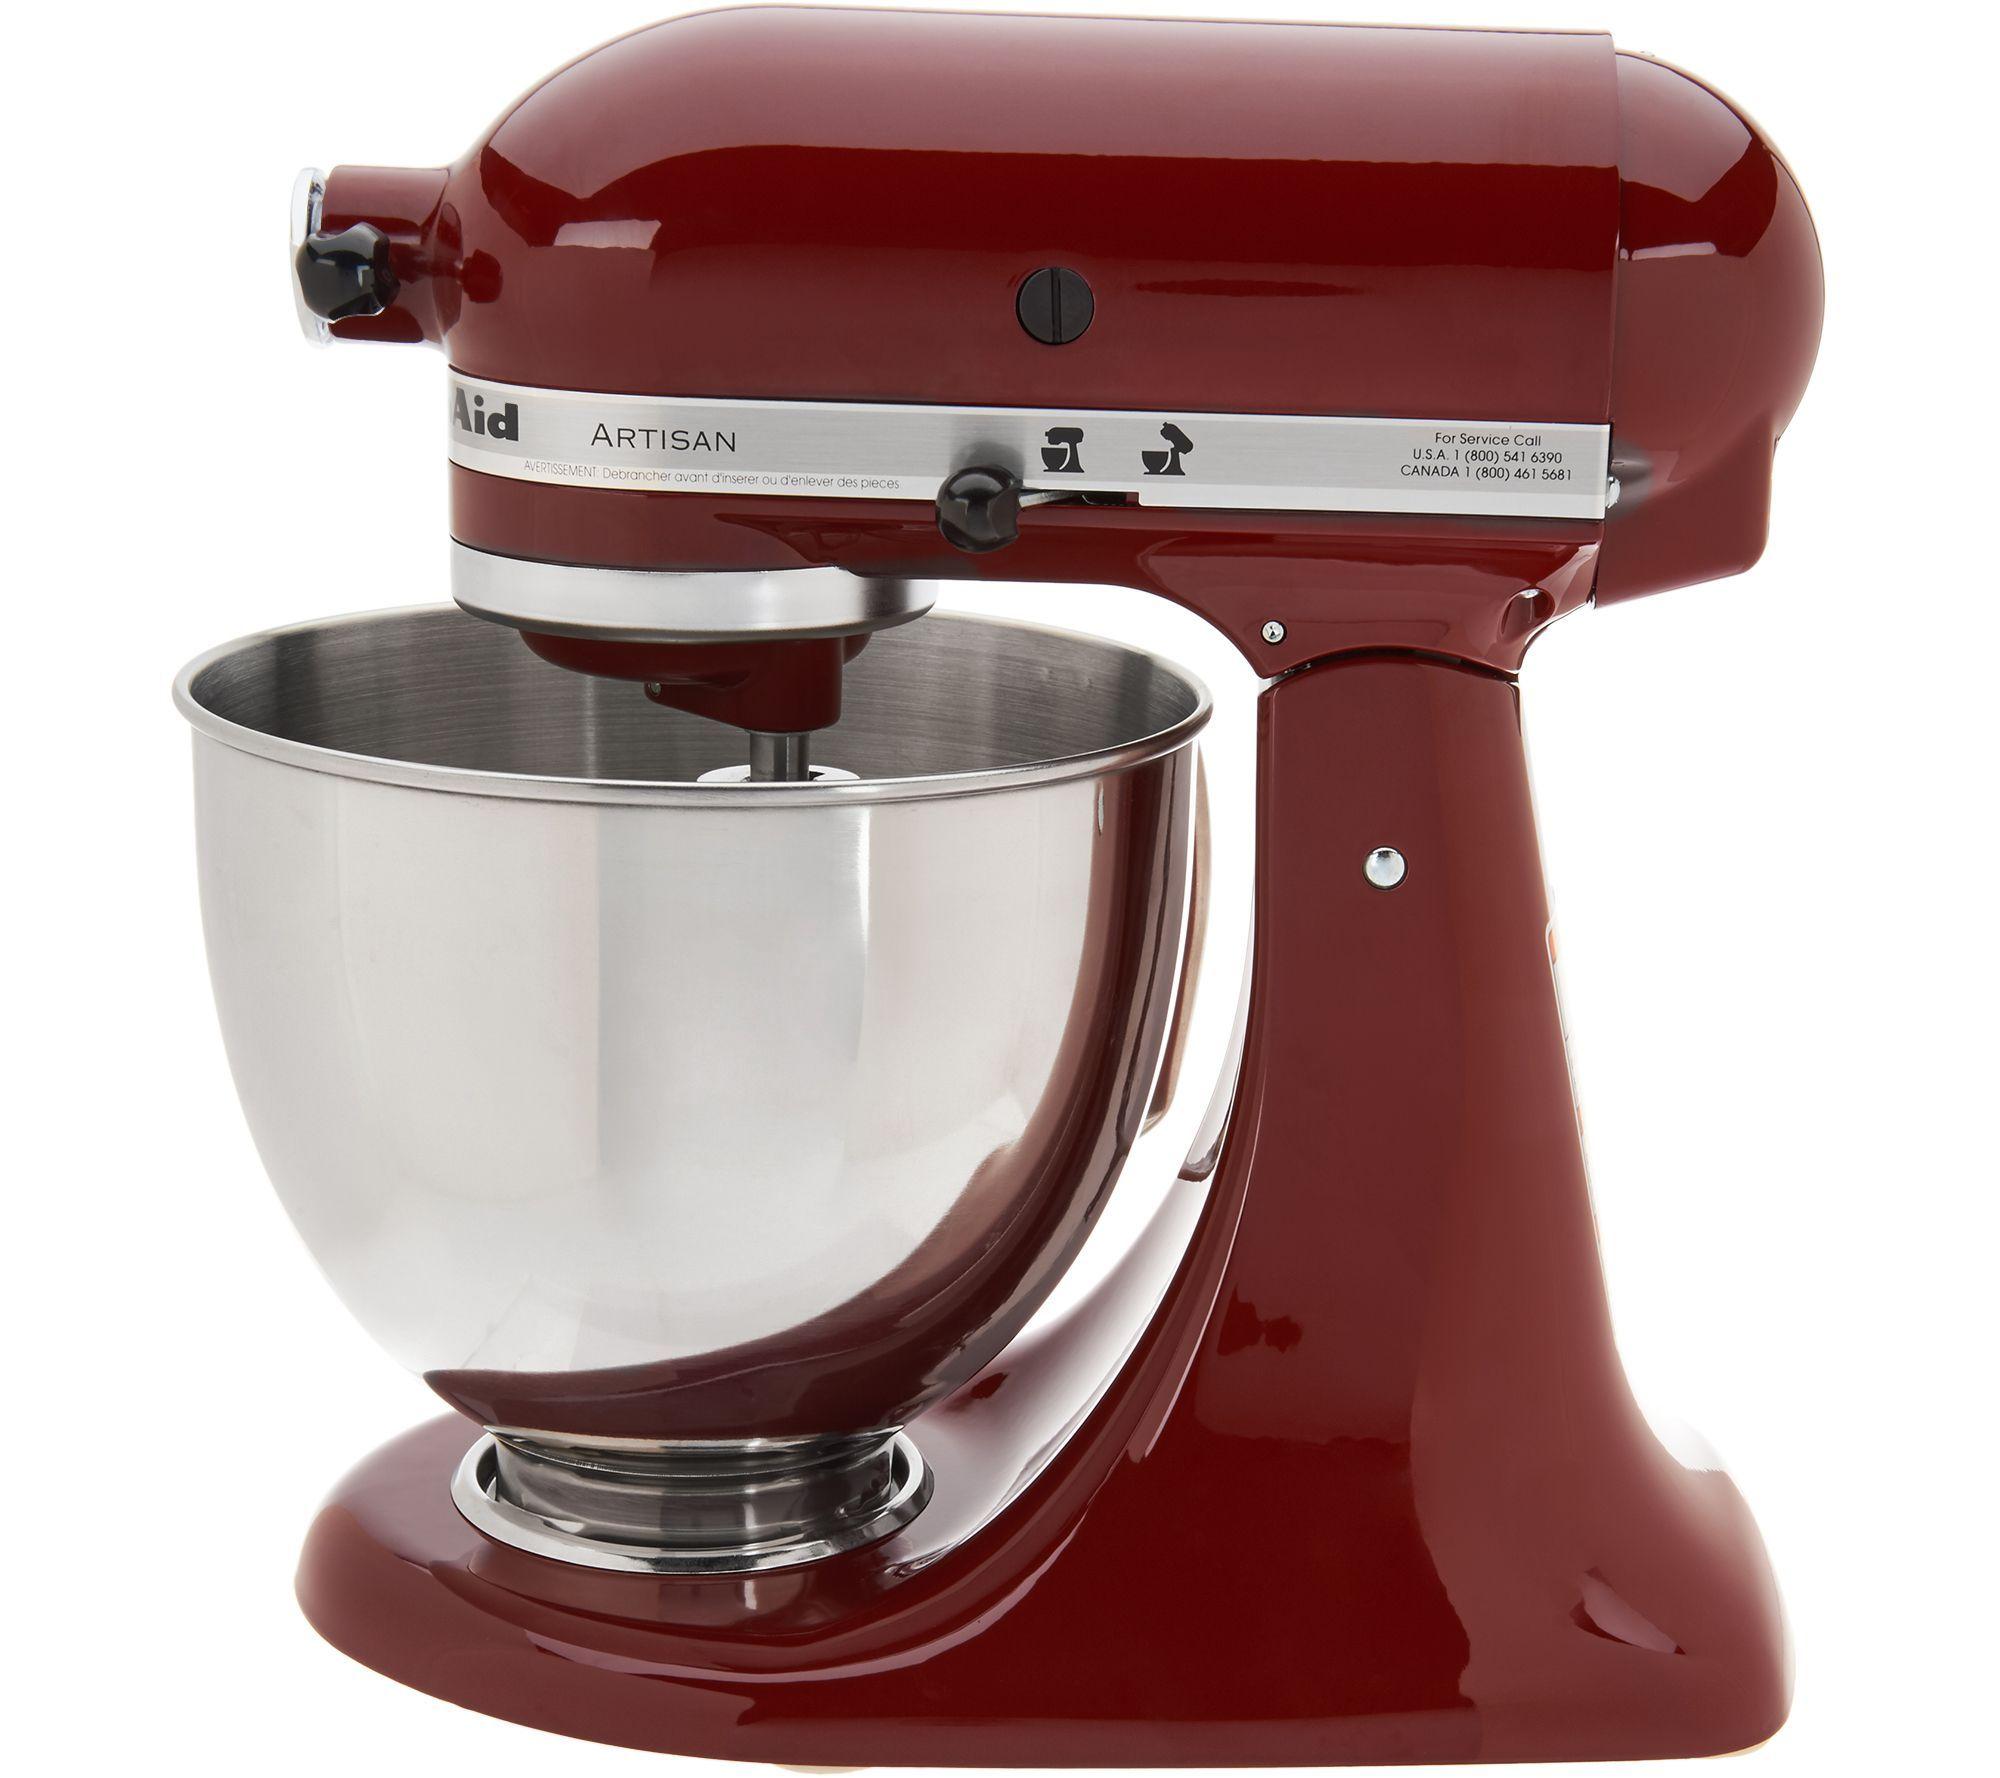 Kitchenaid 5qt 325w artisan stand mixer with flex edge